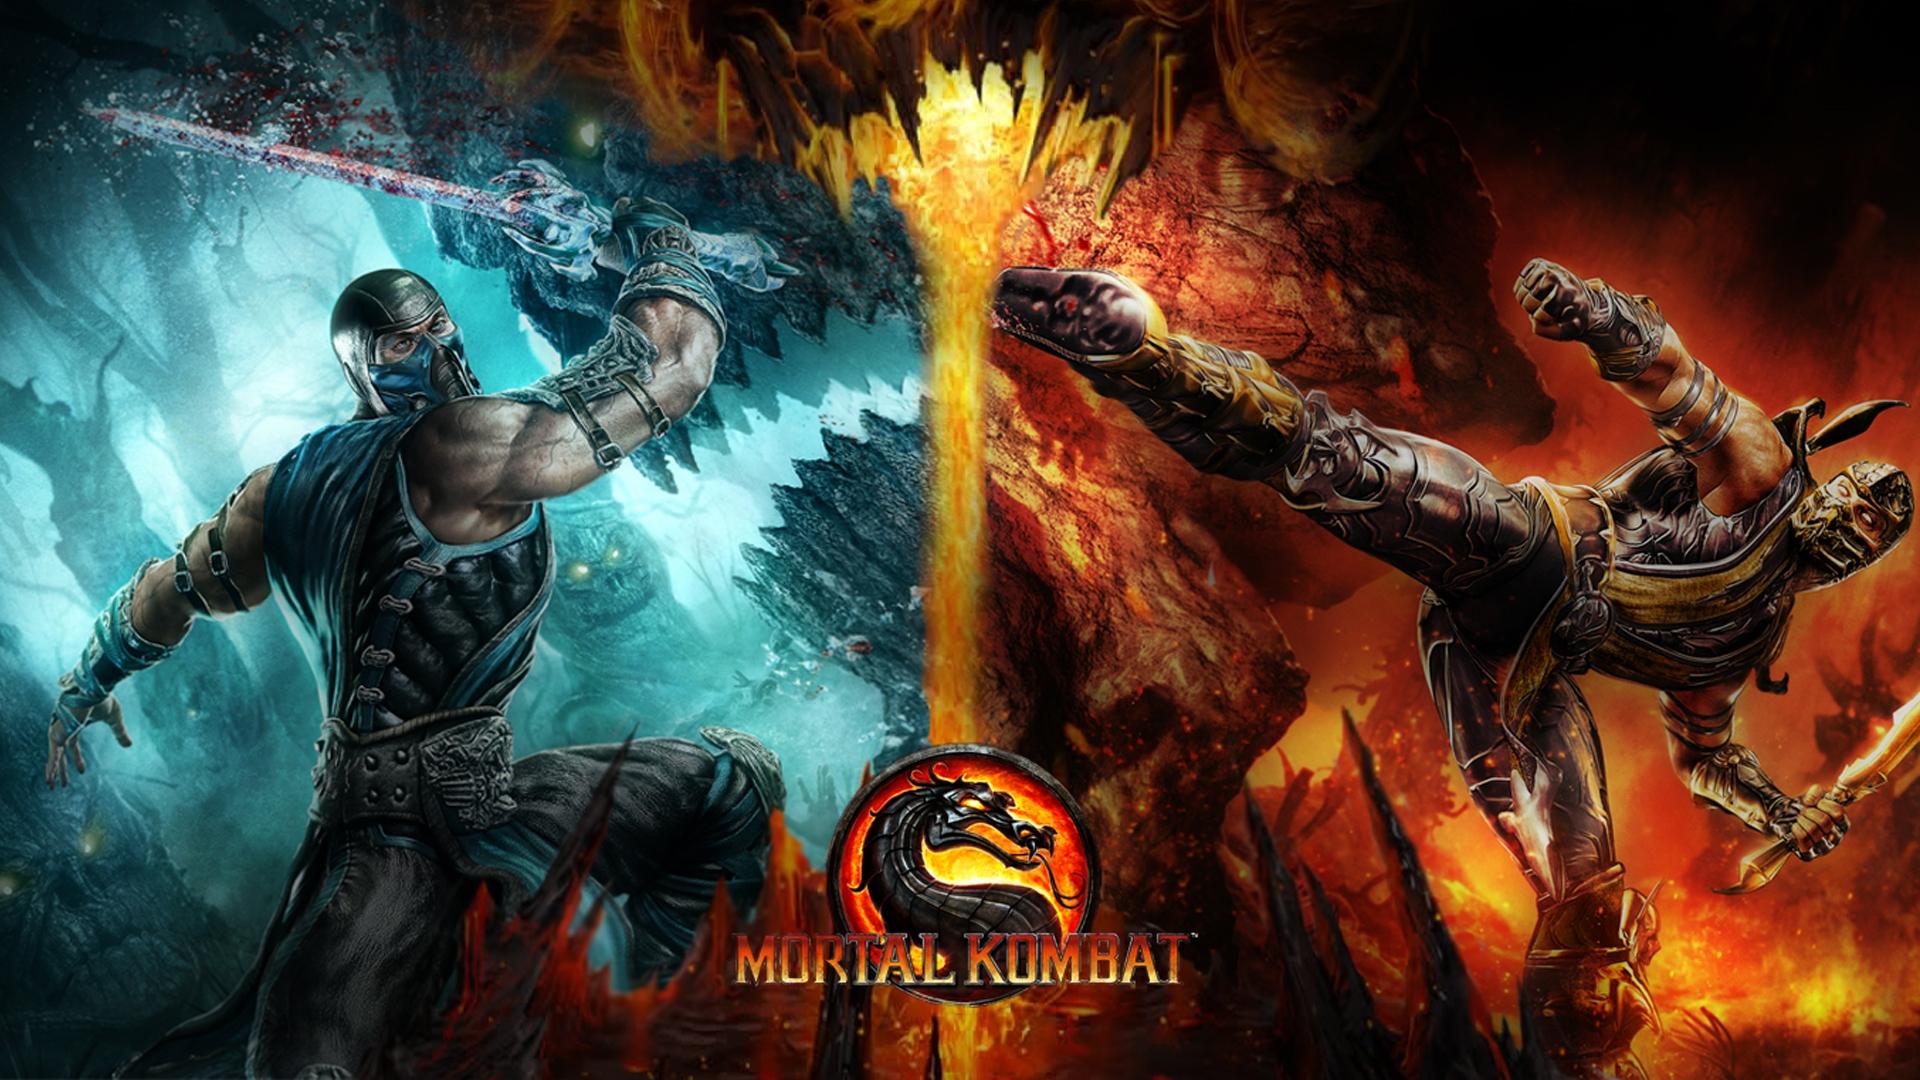 Download Wallpaper 1920x1080 Mortal Kombat Cold Fire Dragon